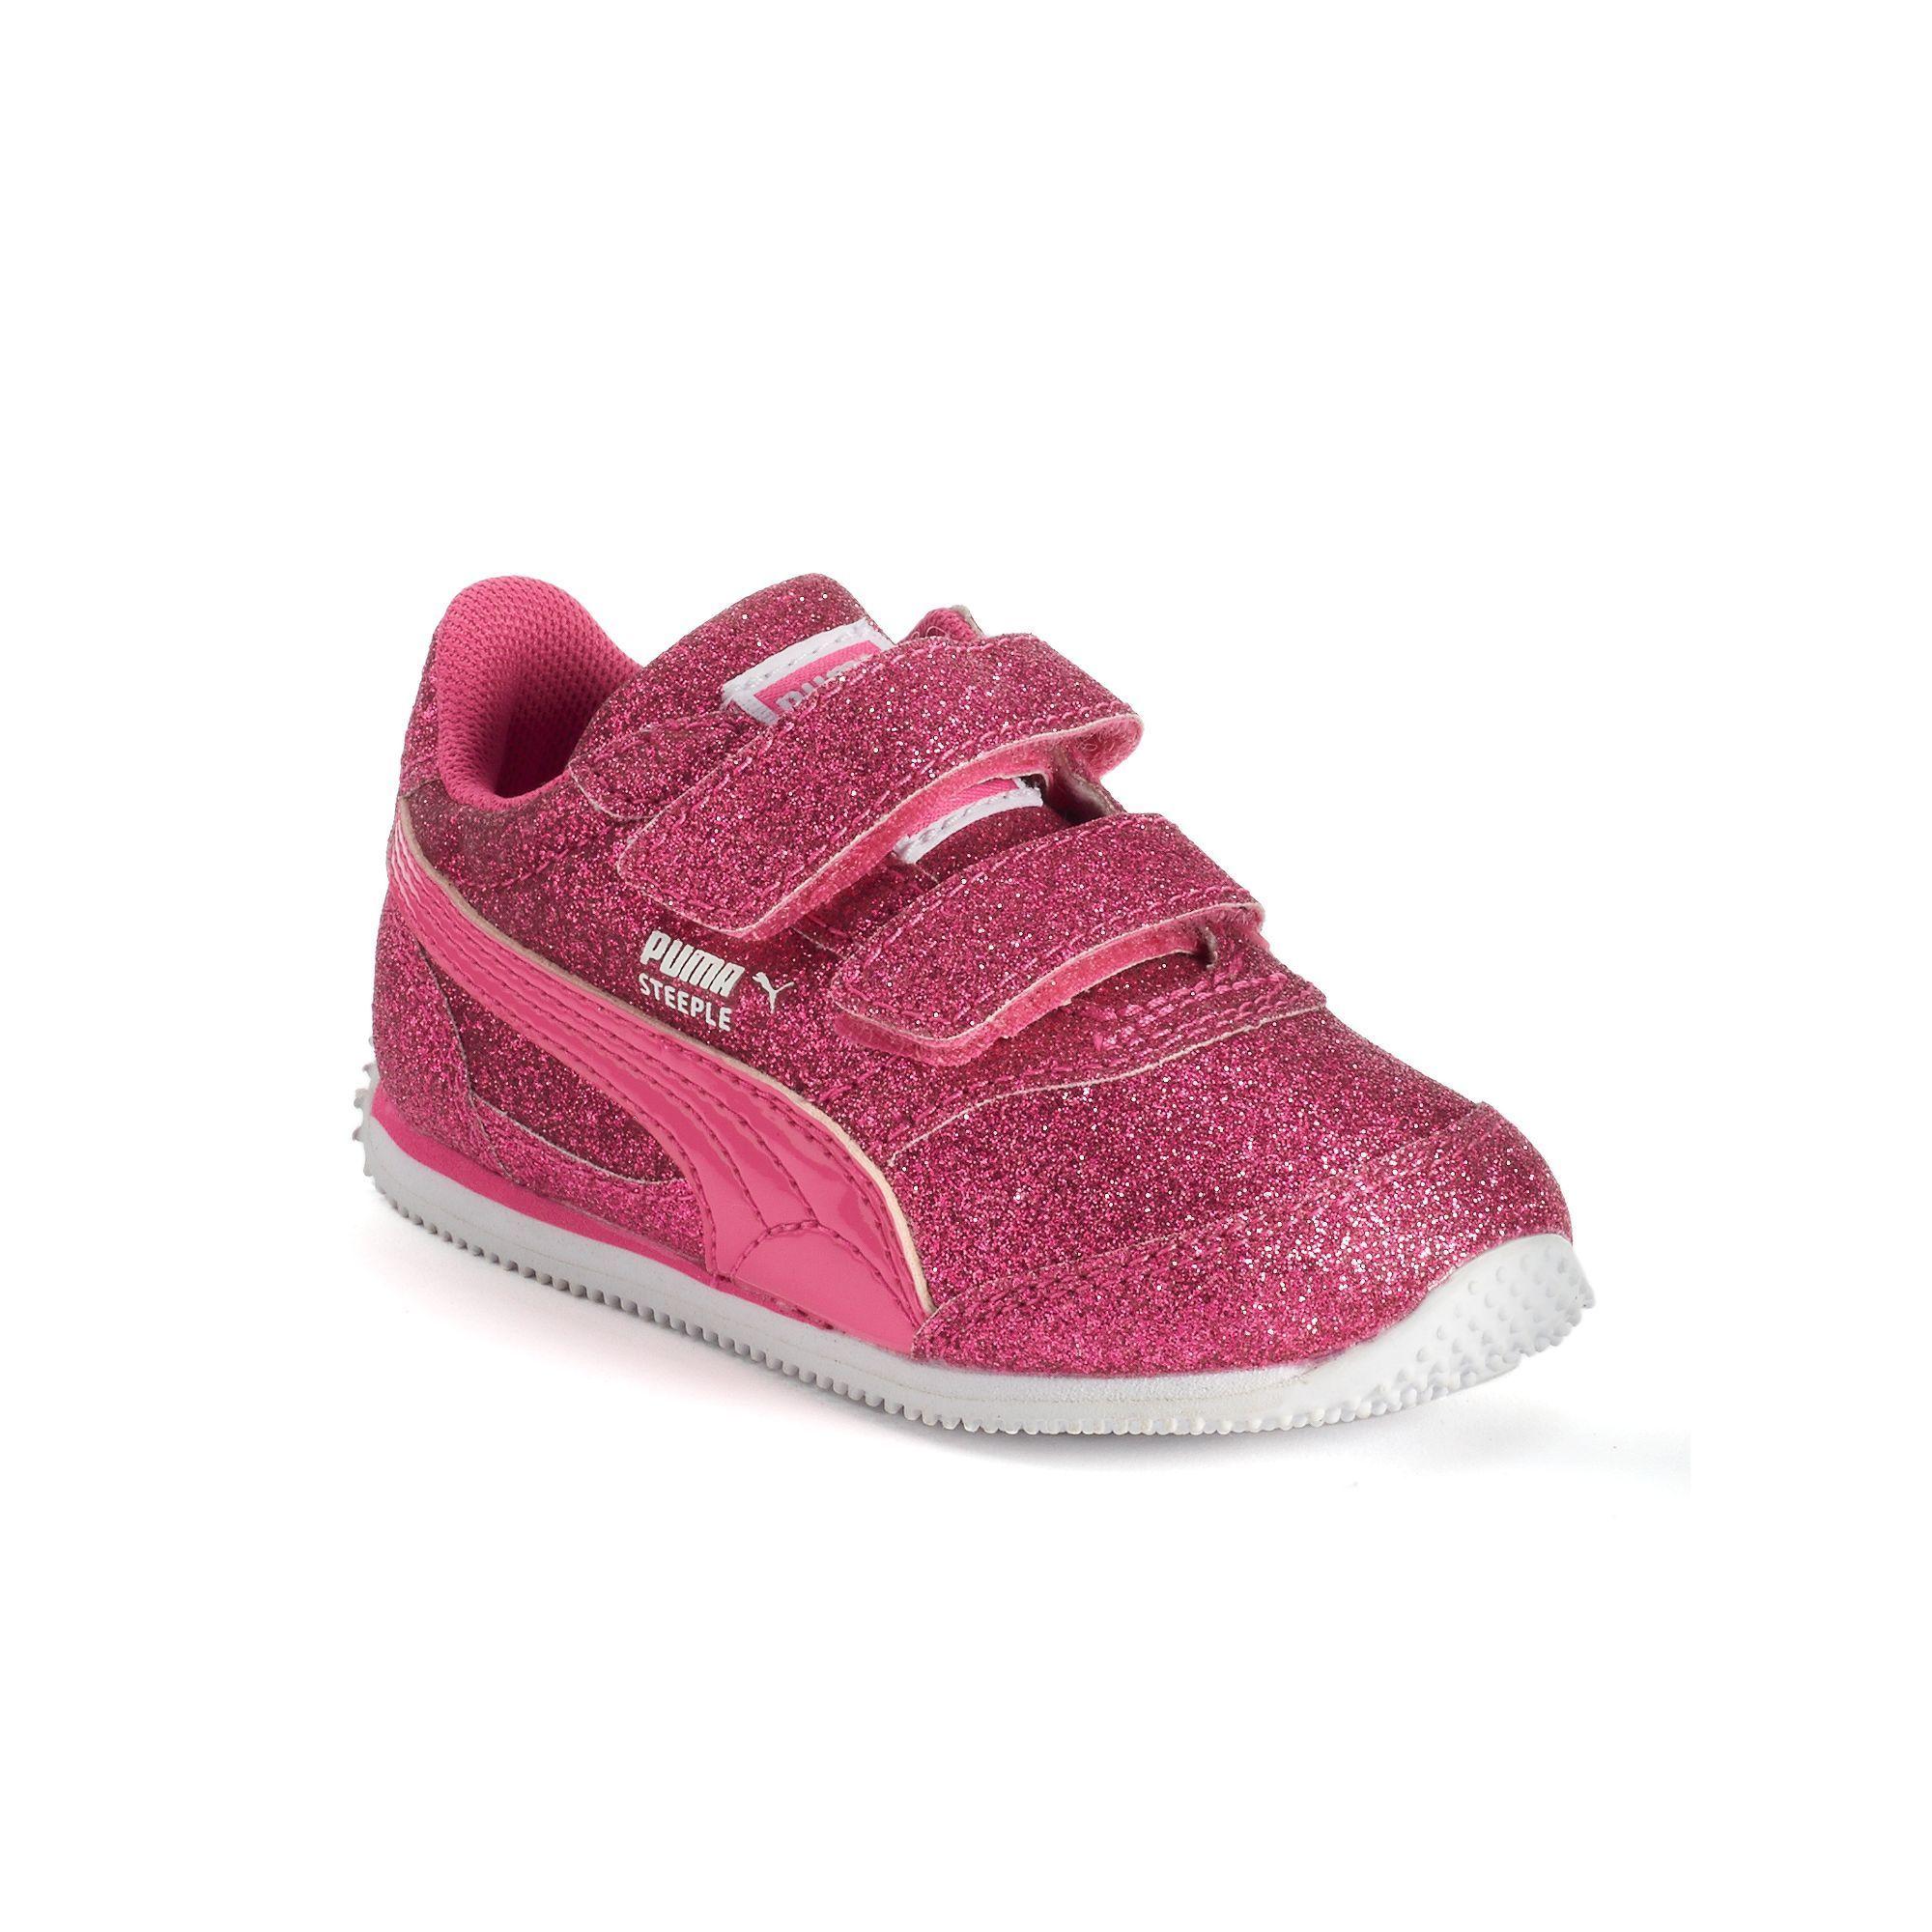 87846fb8cfc PUMA Steeple Glitz Glam V Toddler Girls' Shoes, Girl's, Size: 8 T, Pink